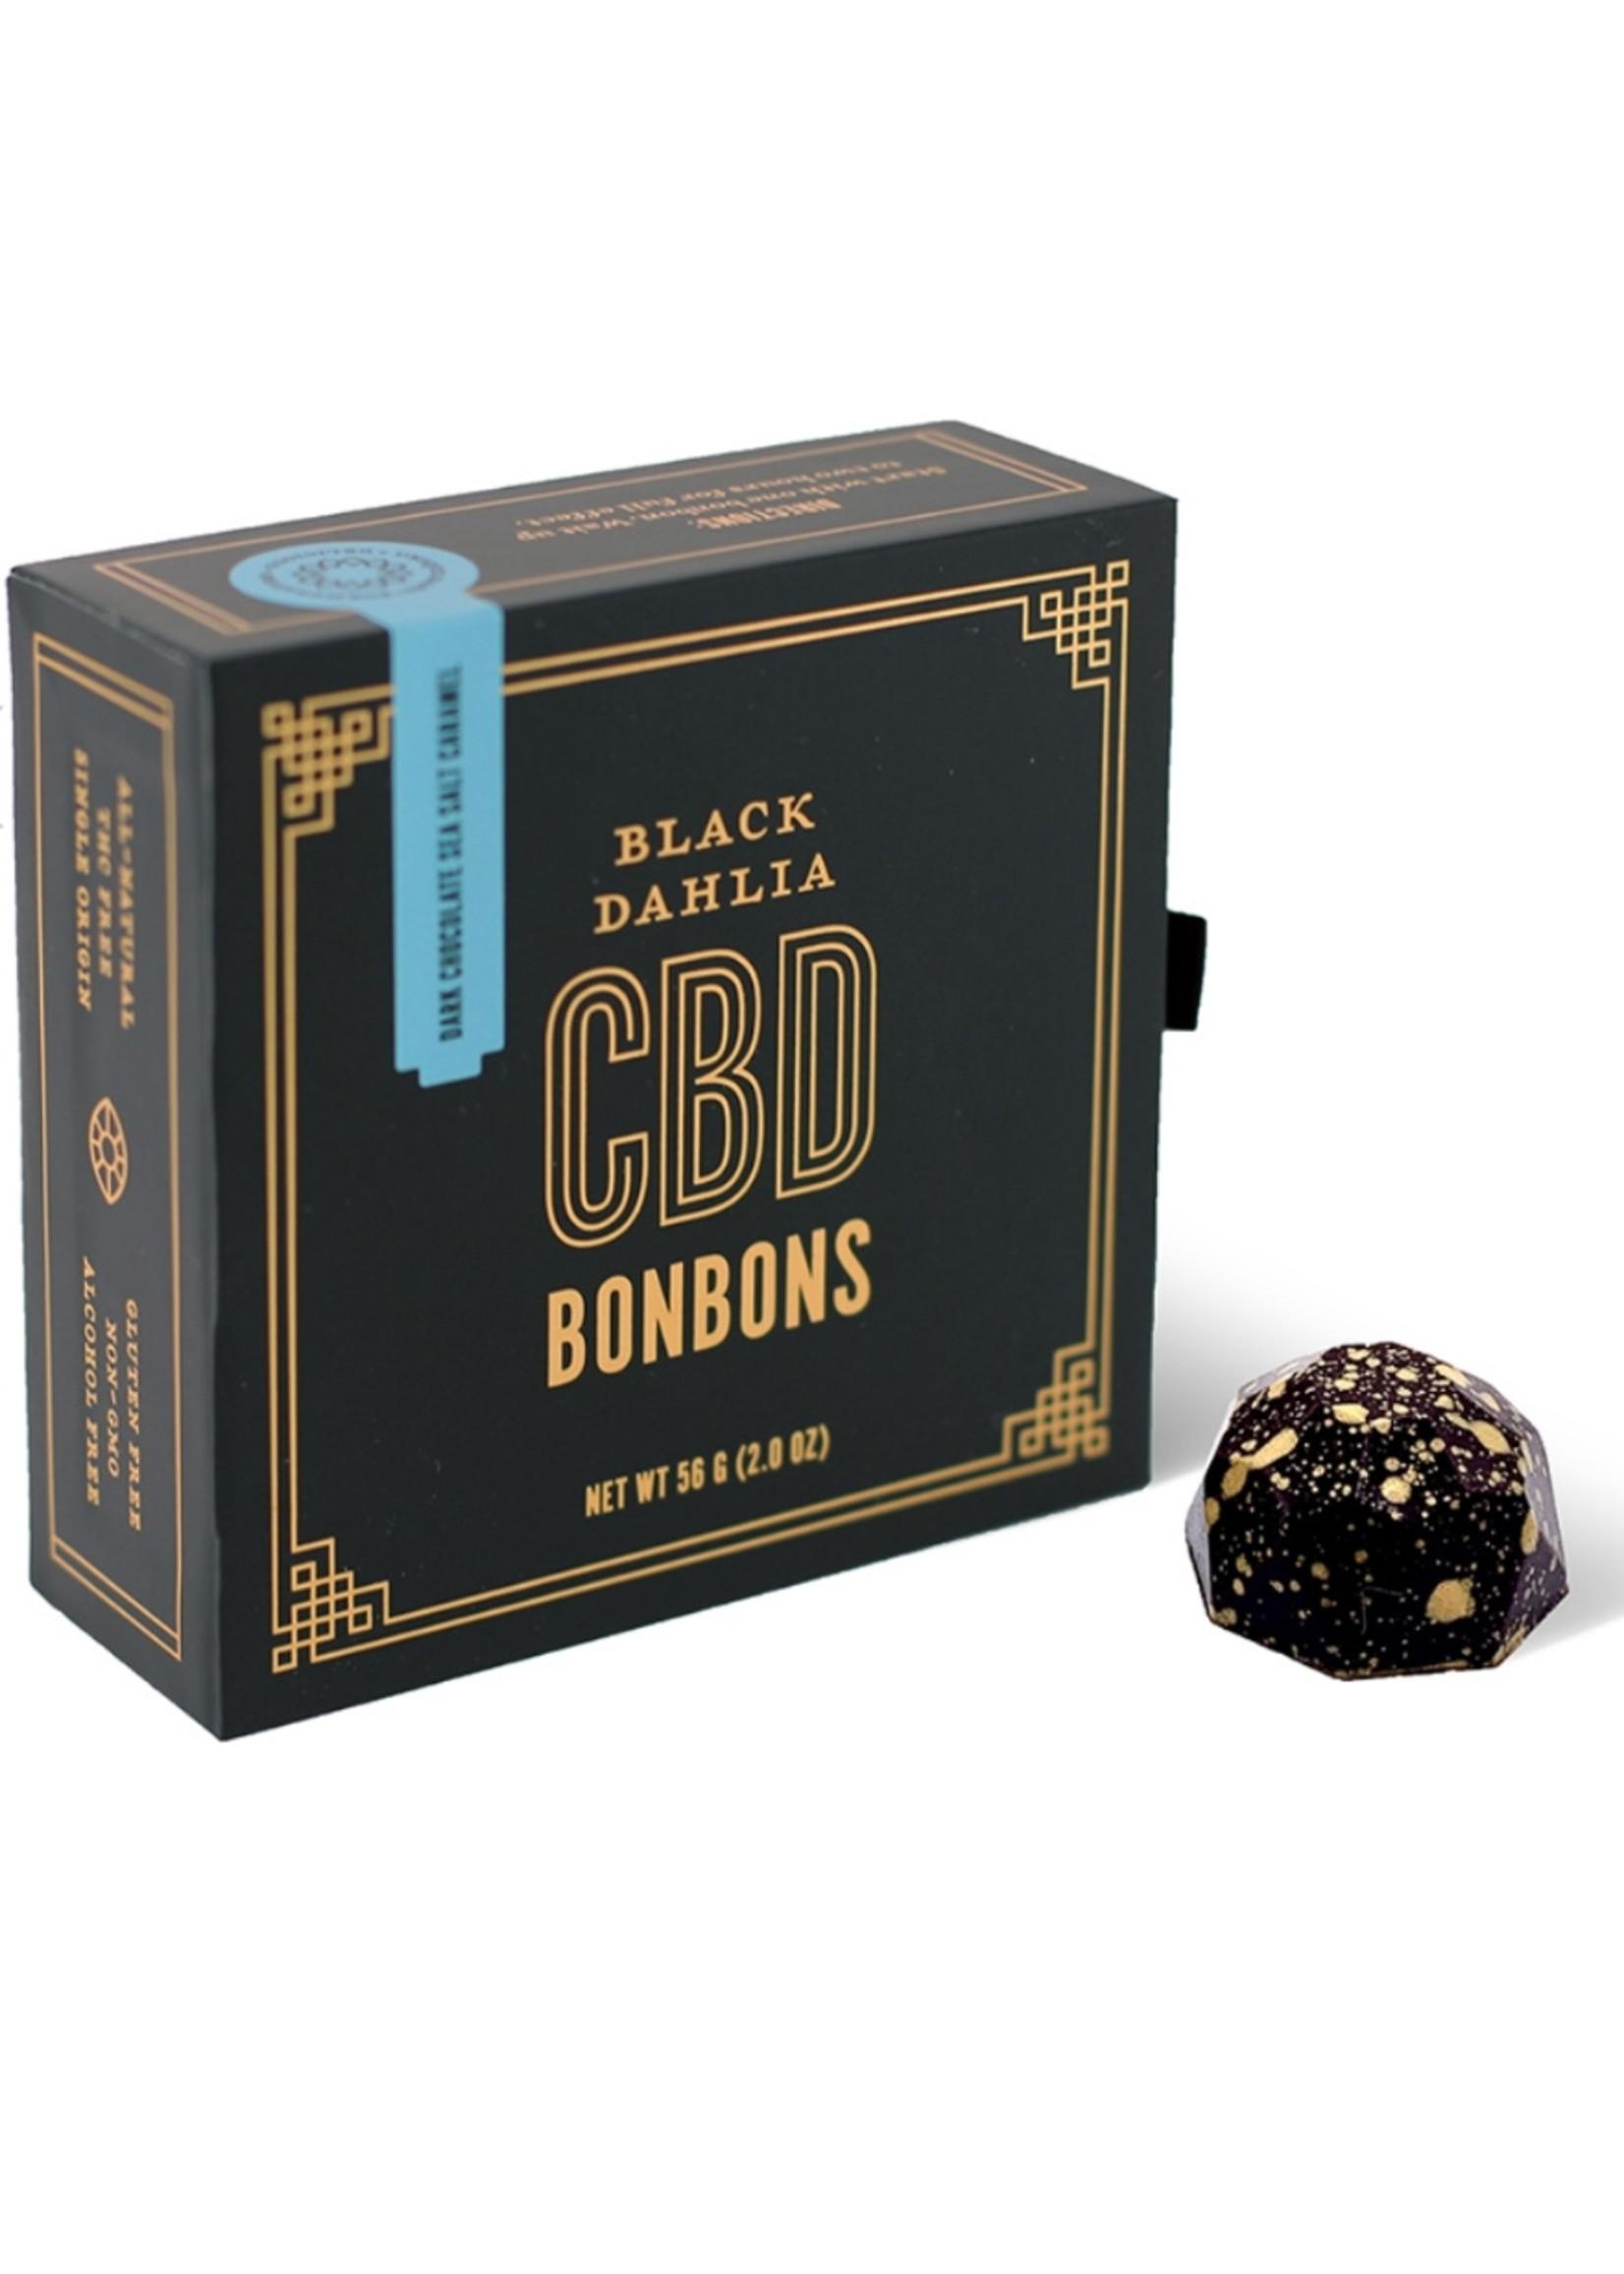 Black Dahlia CBD Botanicals Black Dahlia Dark Chocolate Sea Salt CBD Bonbons